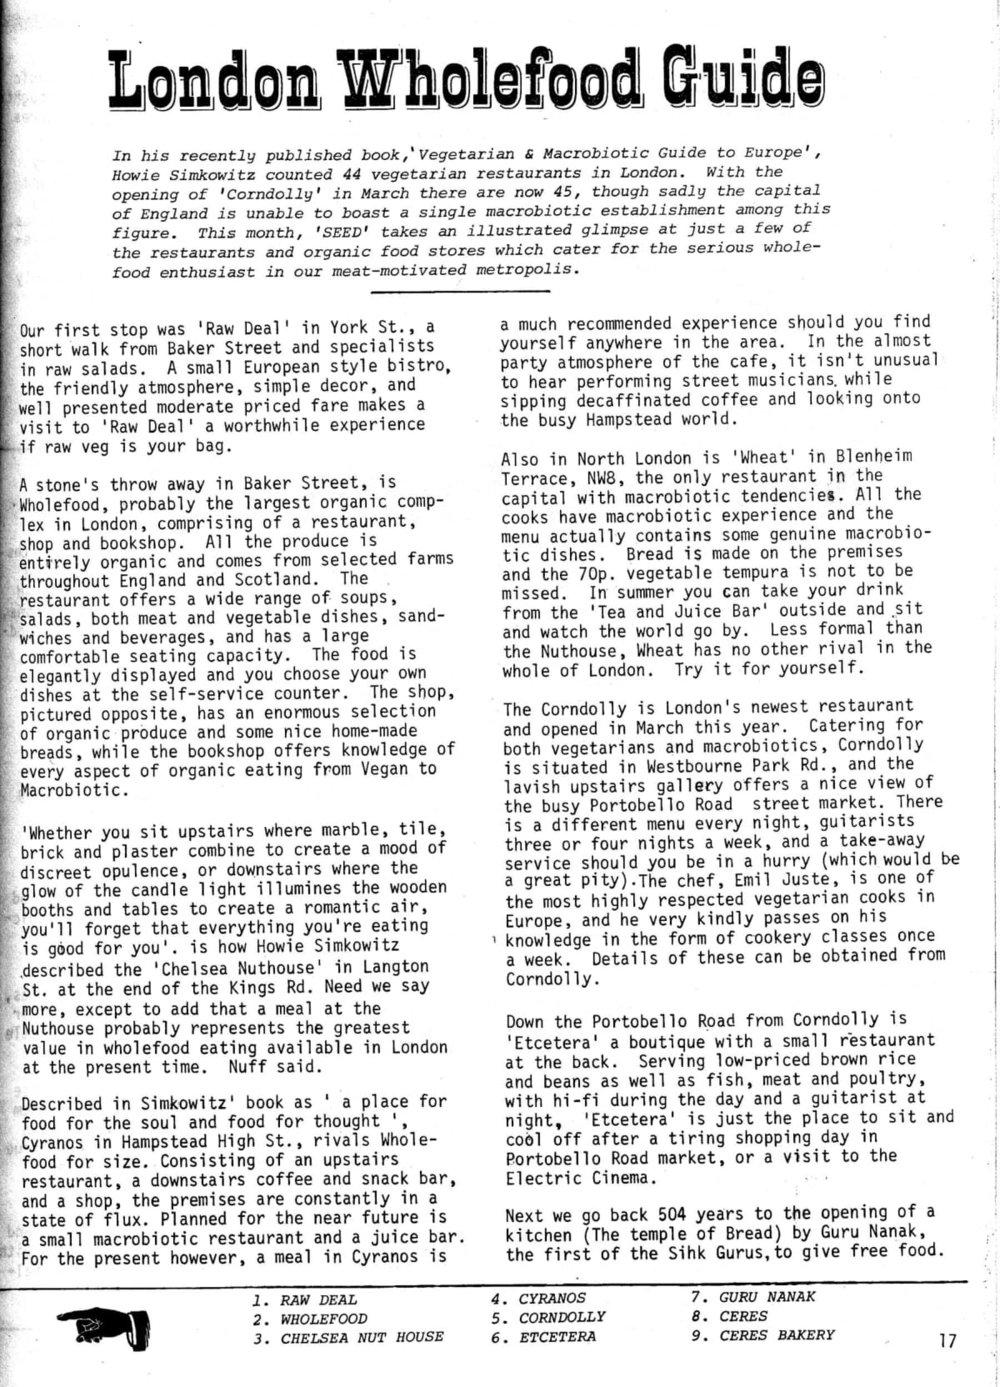 seed-v2-n5-may1973-17.jpg